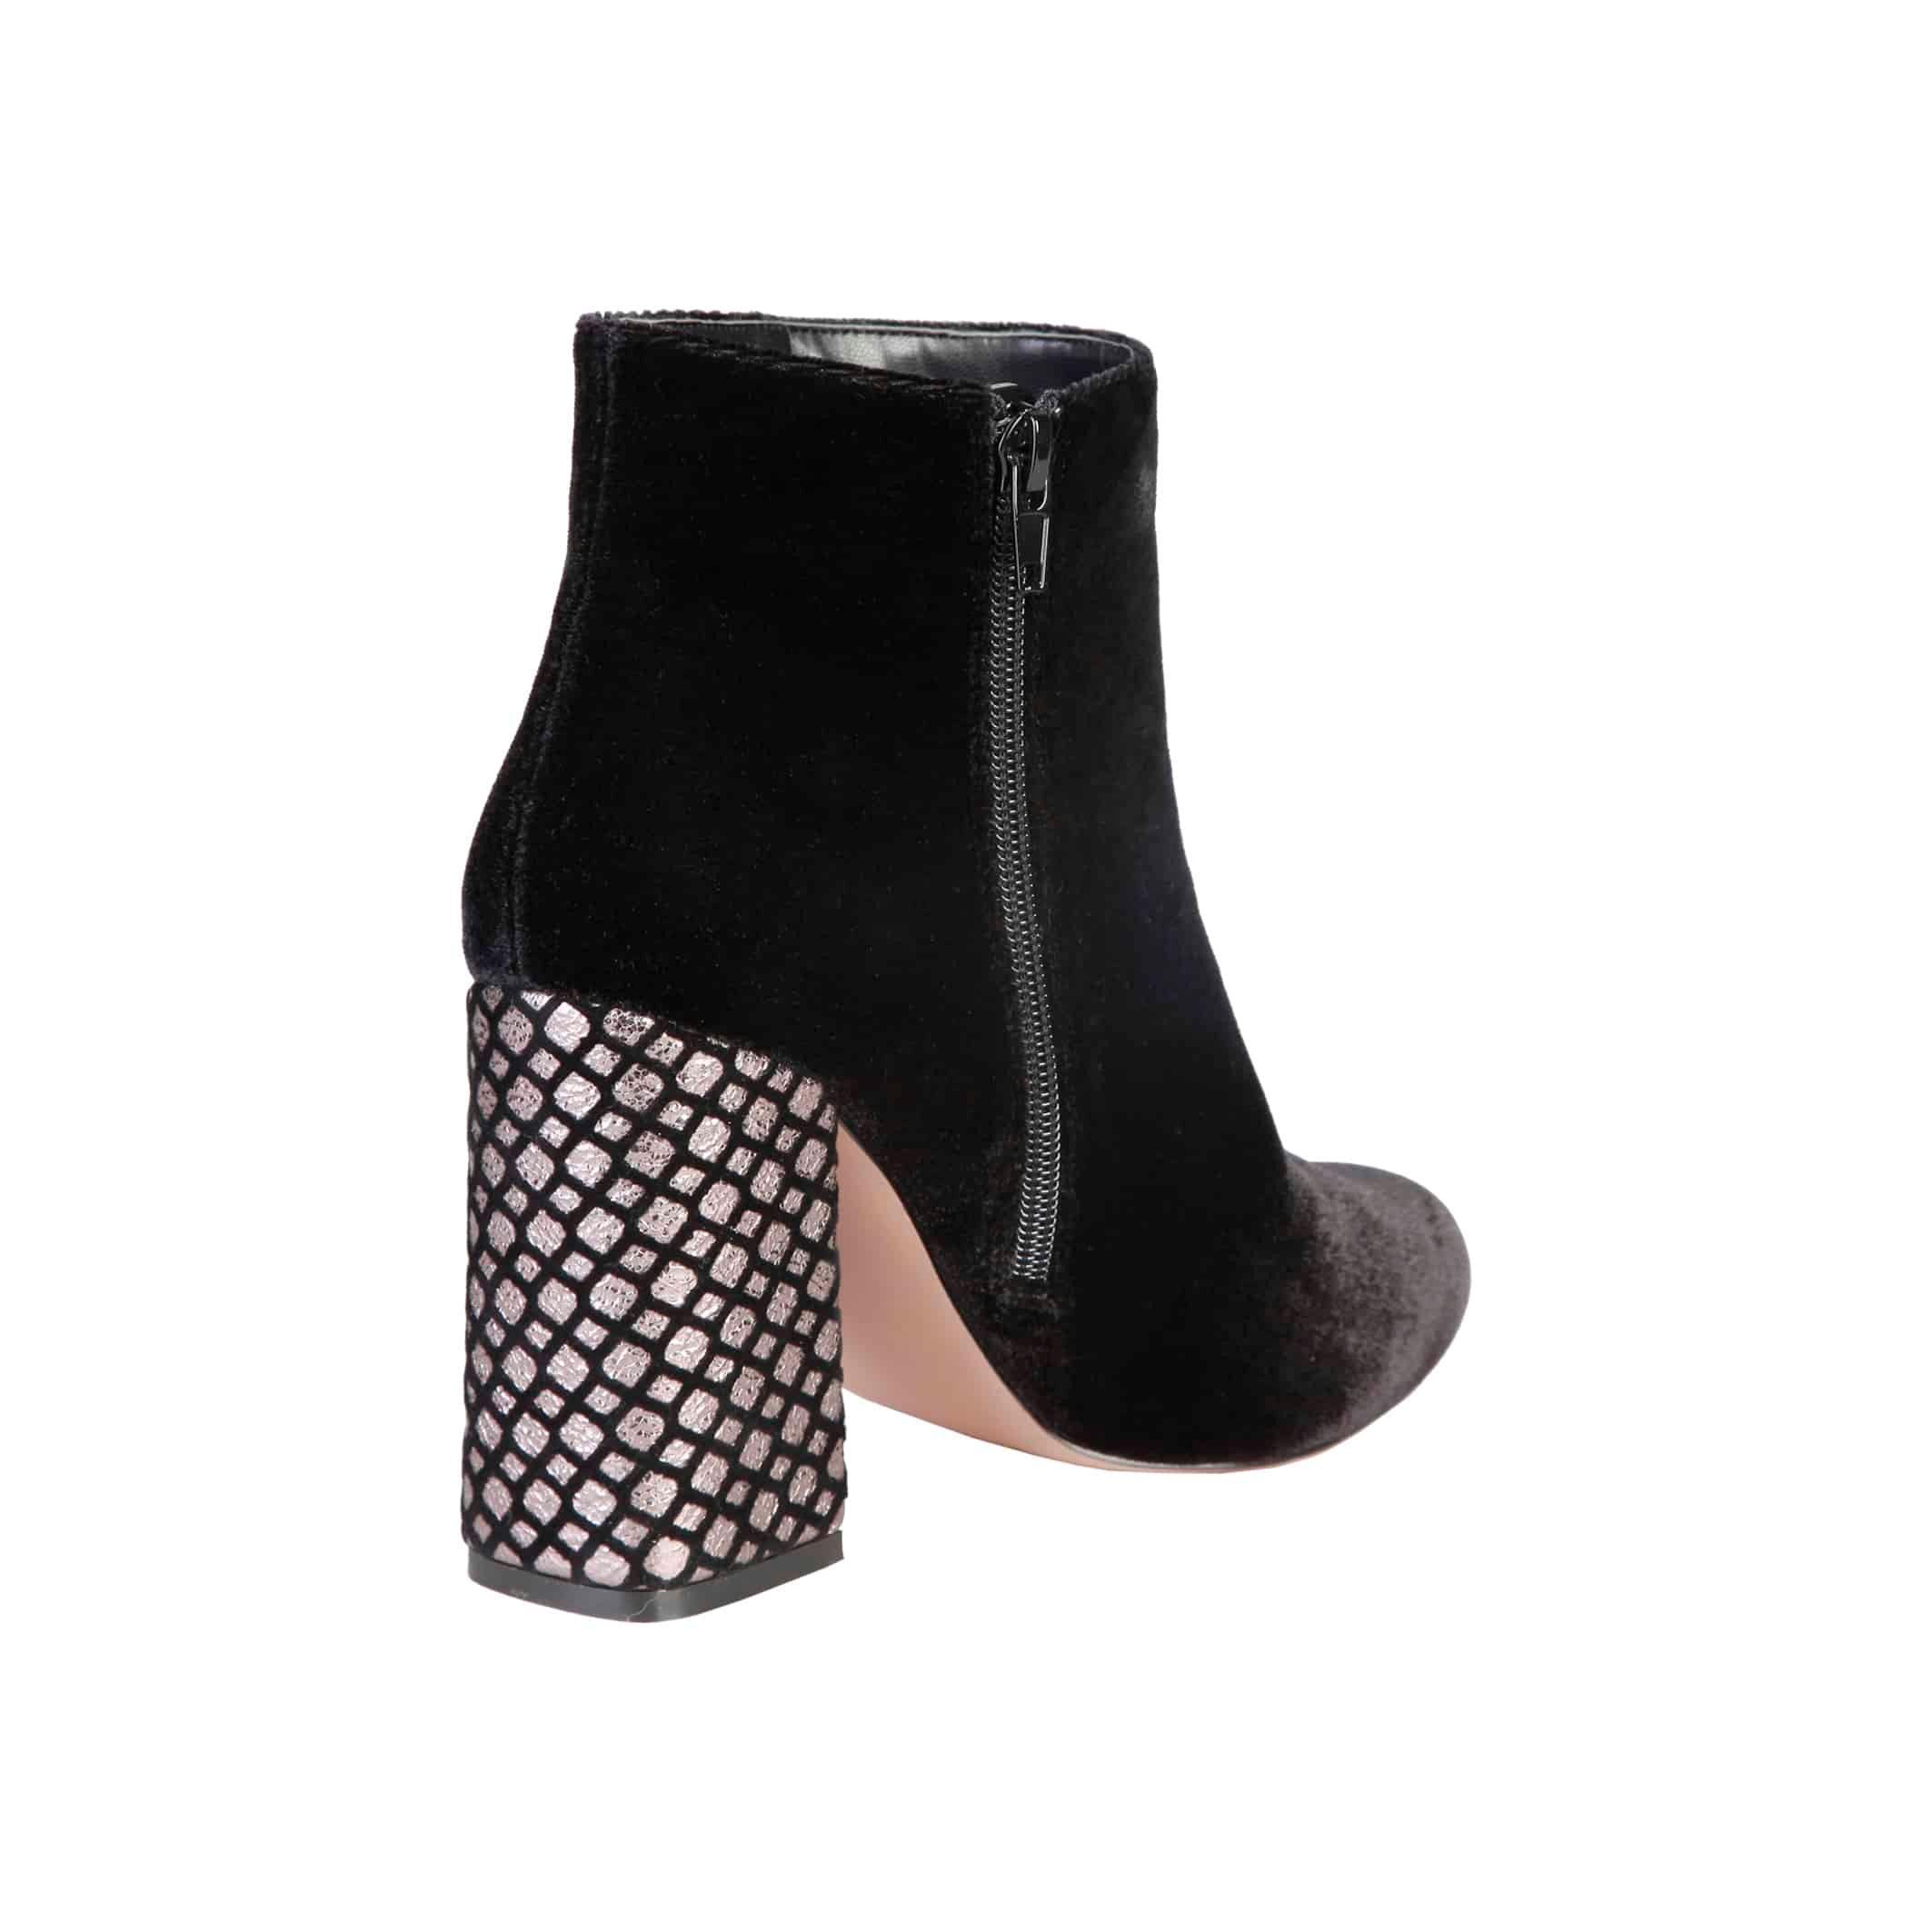 Ankle boots Fontana 2.0 – LADA